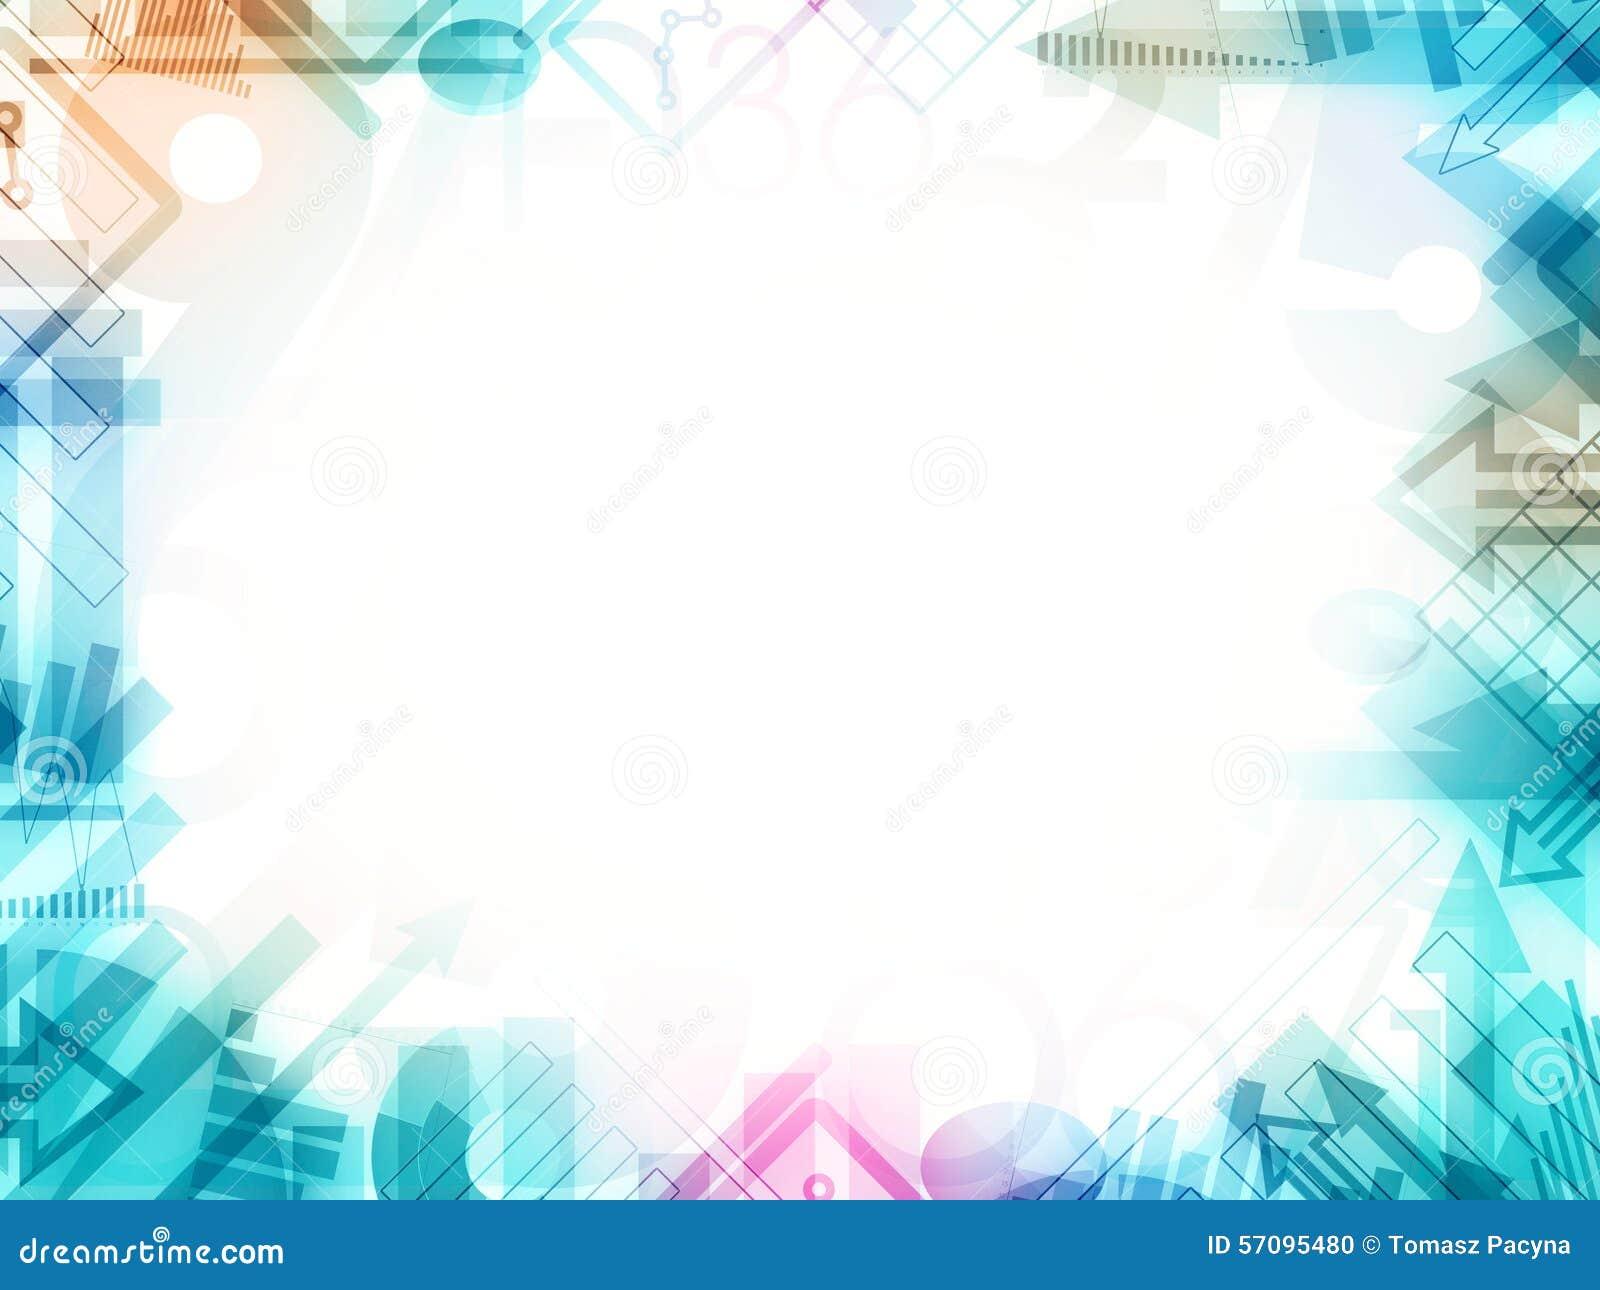 Abstract Statistics Frame Border Stock Illustration - Illustration ...